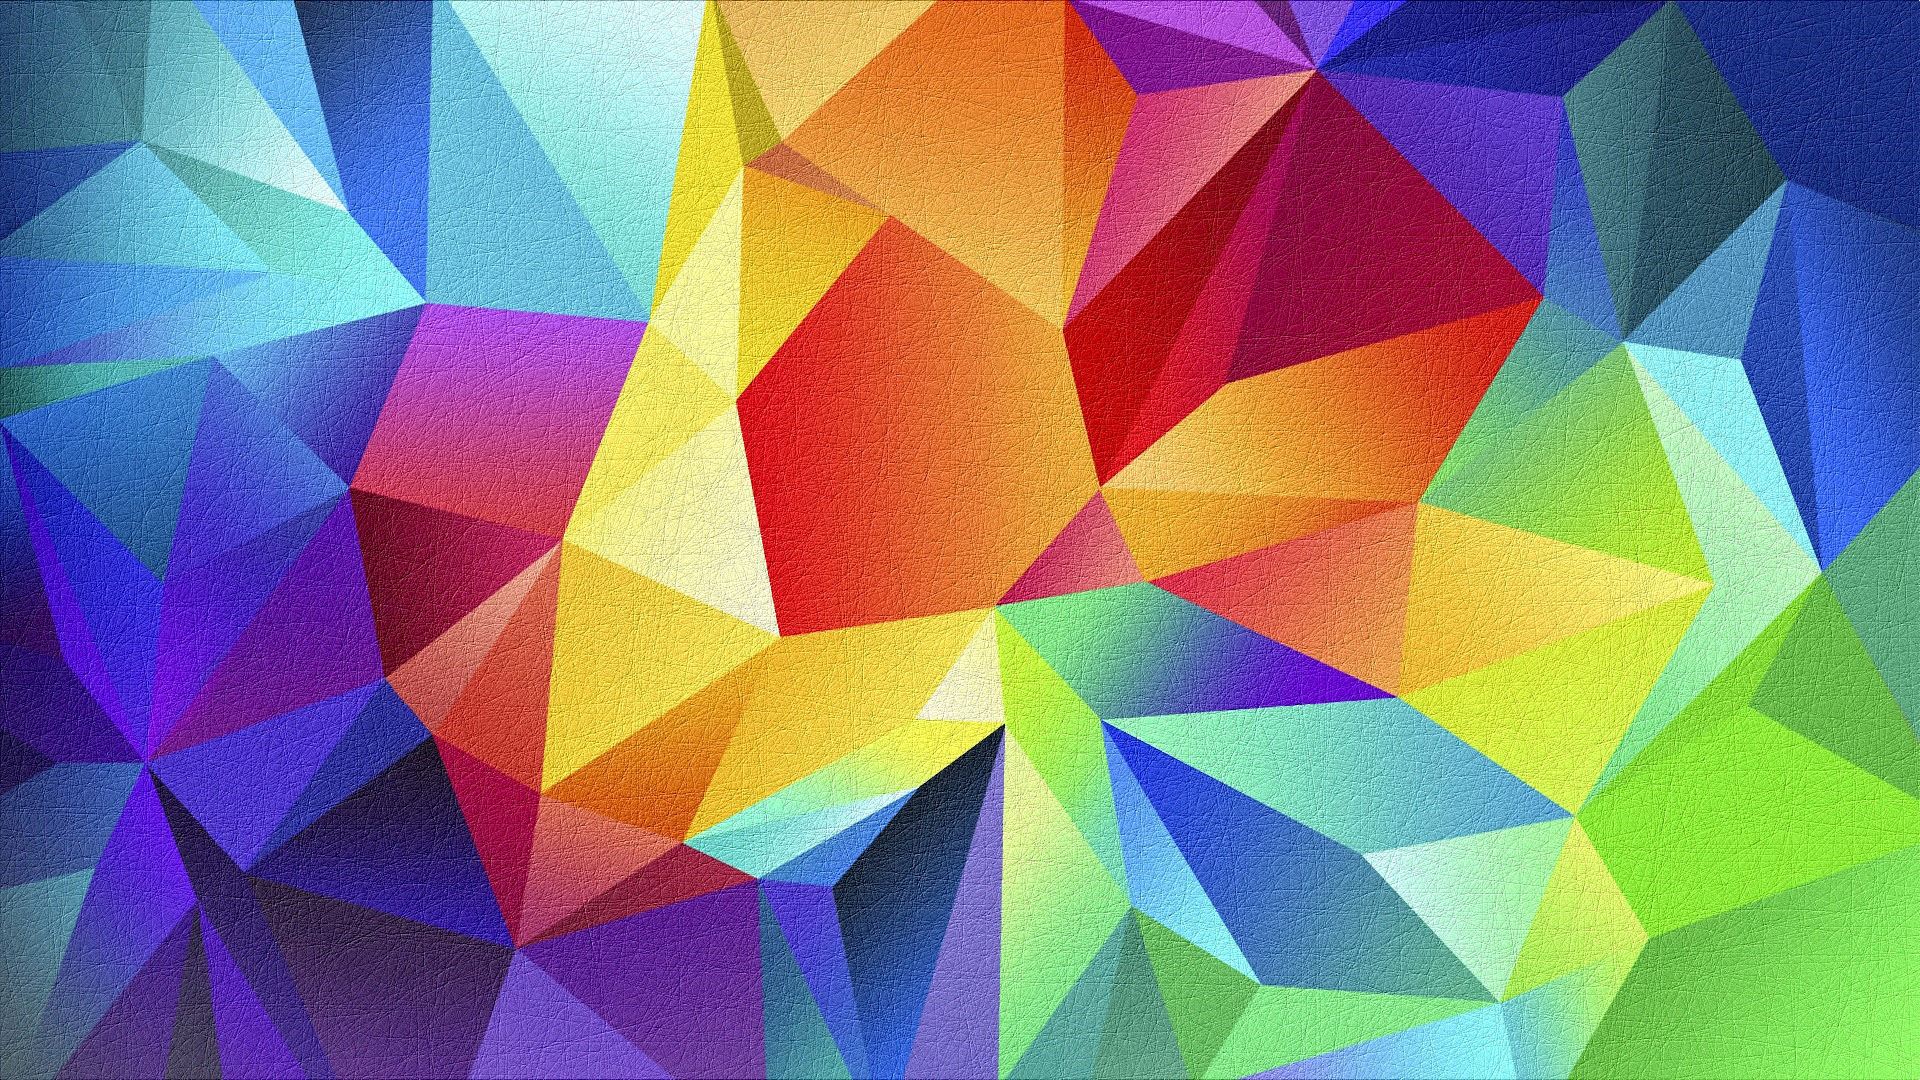 Samsung Galaxy Abstract wallpaper 1920x1080 32998 1920x1080